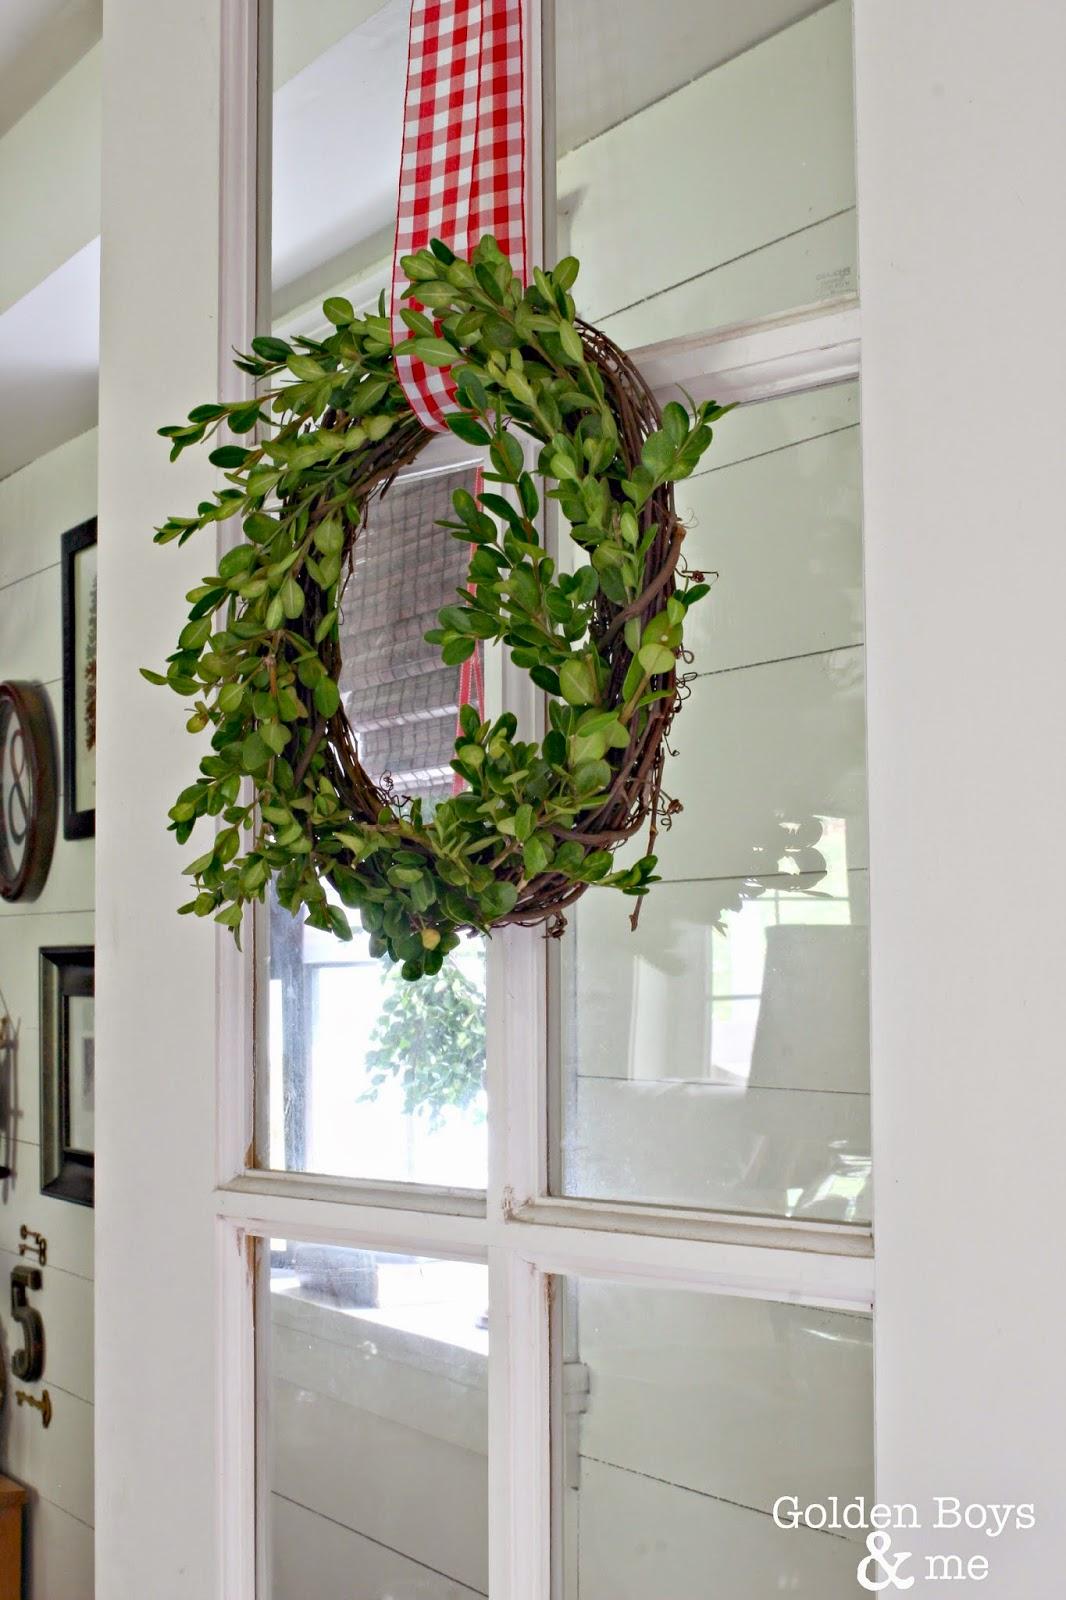 DIY boxwood wreath on french door with plank wall behind-www.goldenboysandme.com